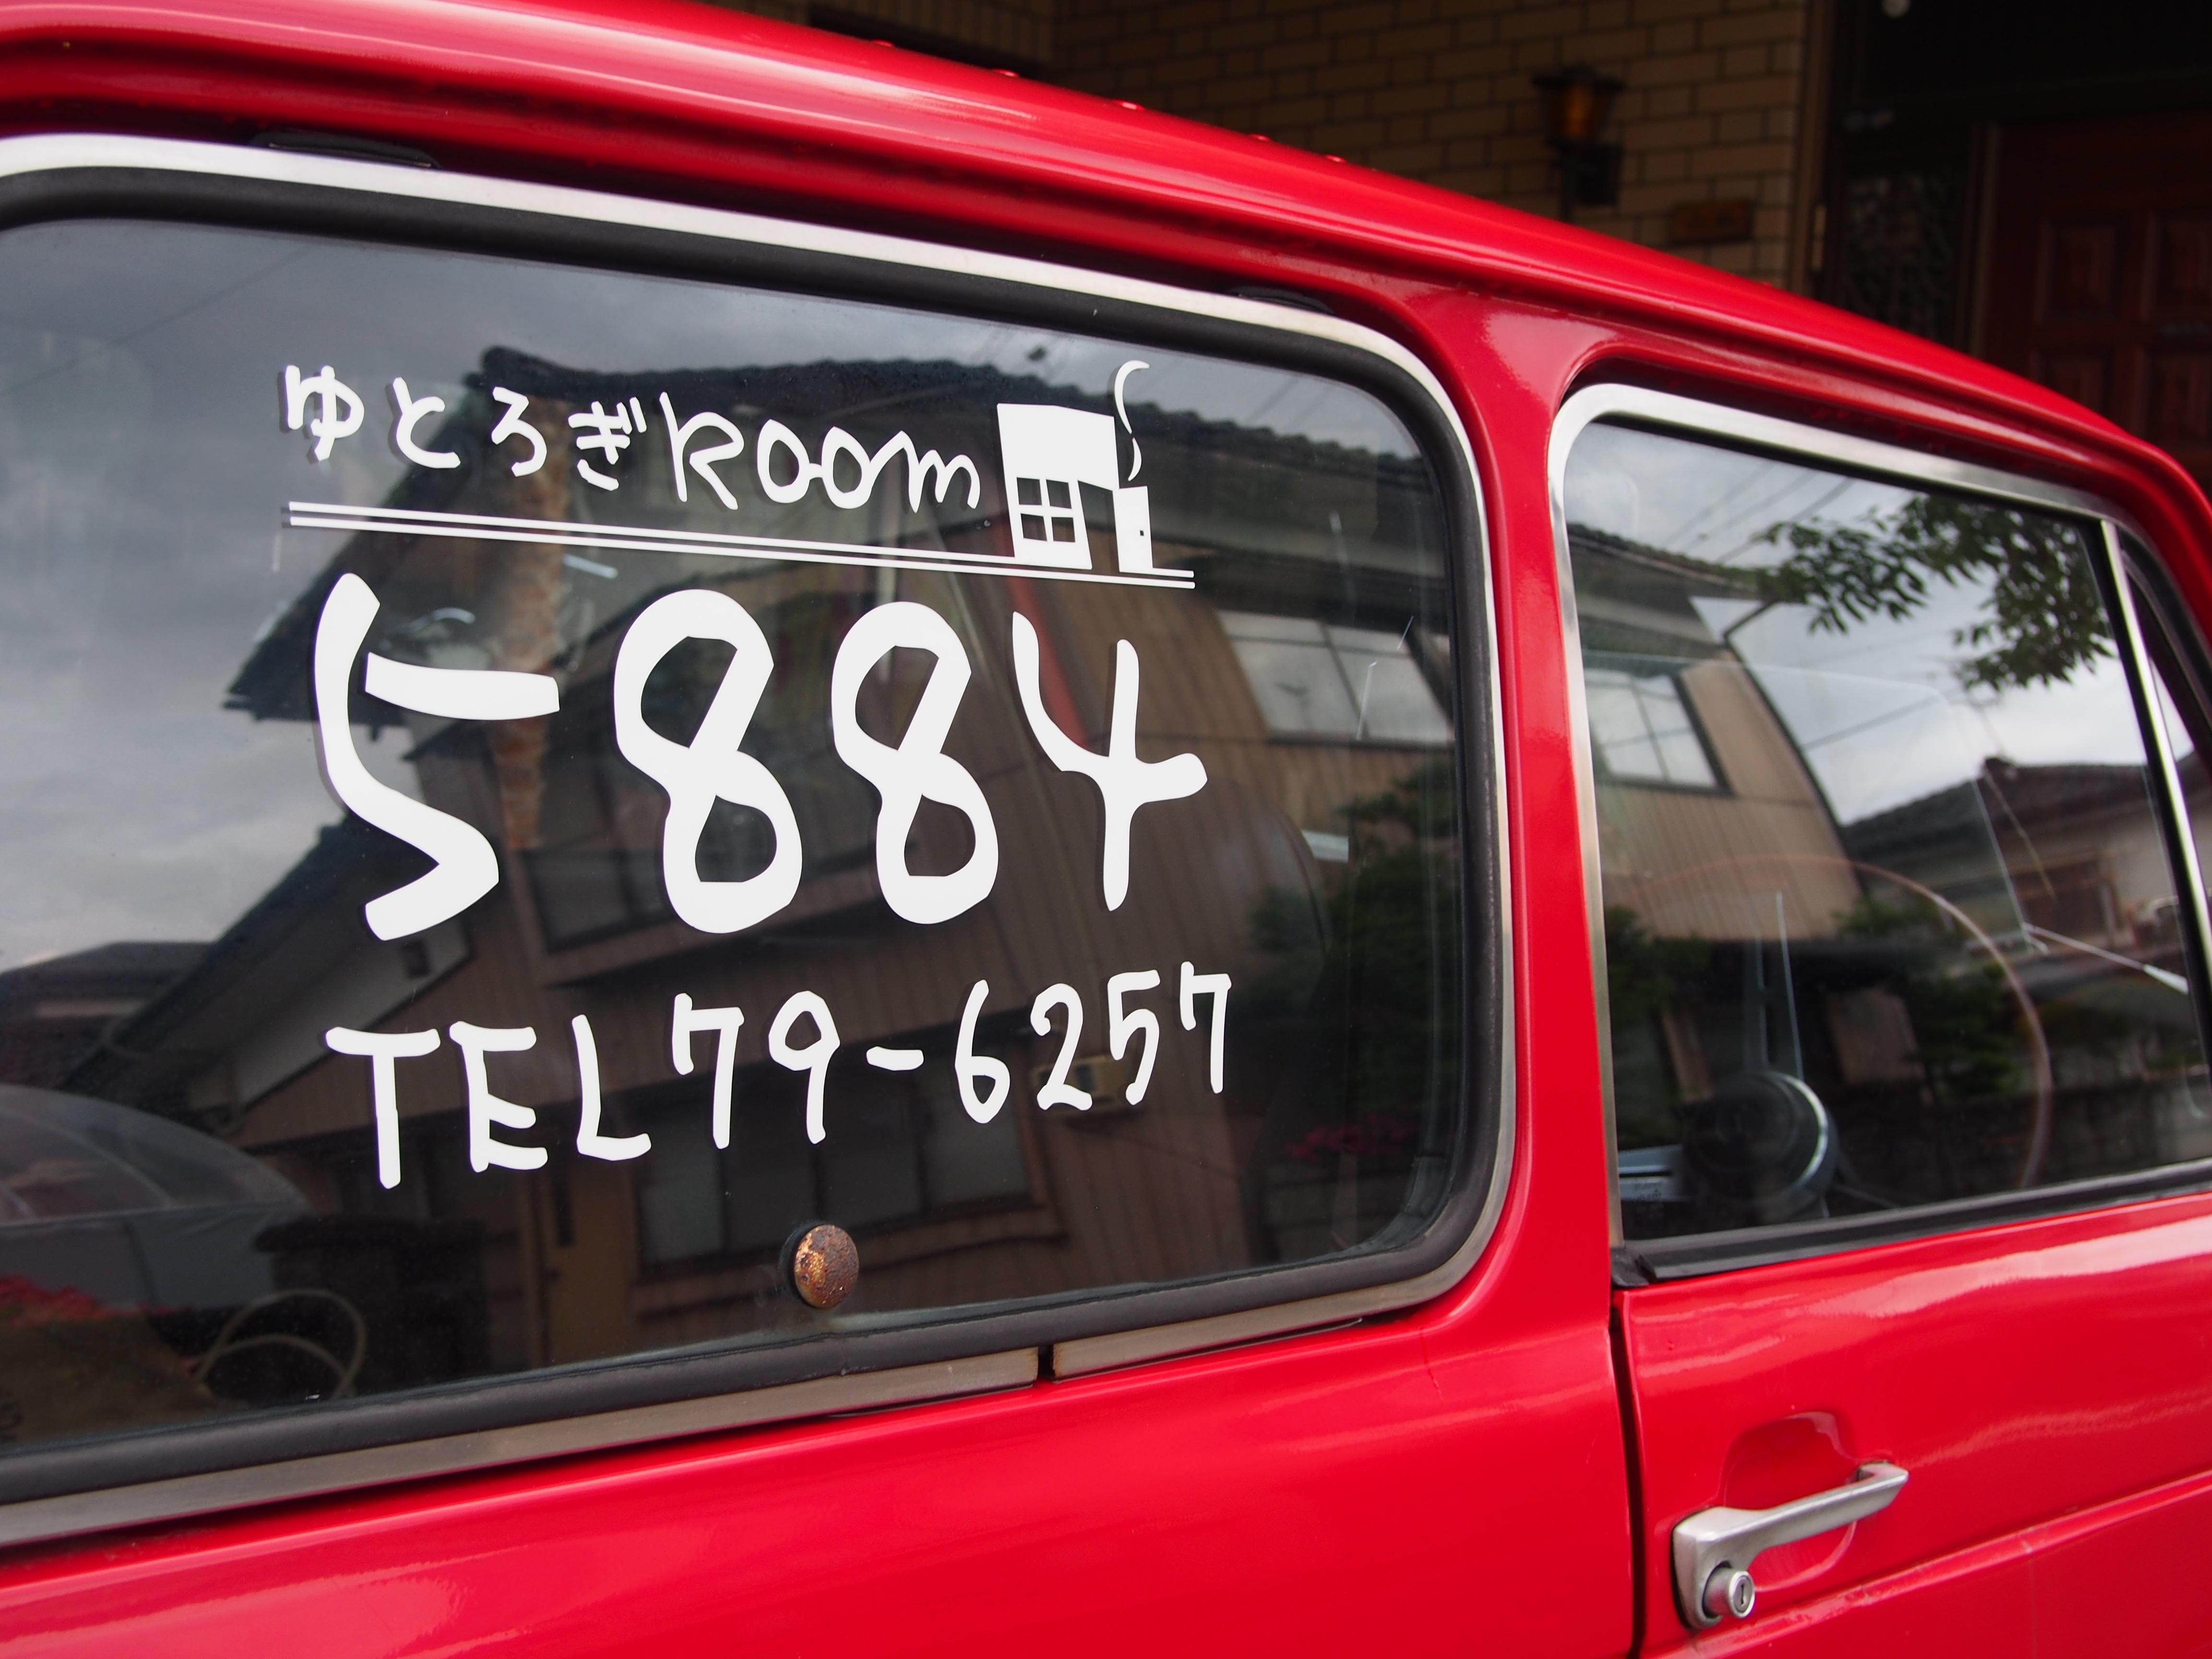 THE 対談。【ゆとろぎroom5884】経営。小林圭太郎(長野県箕輪町)